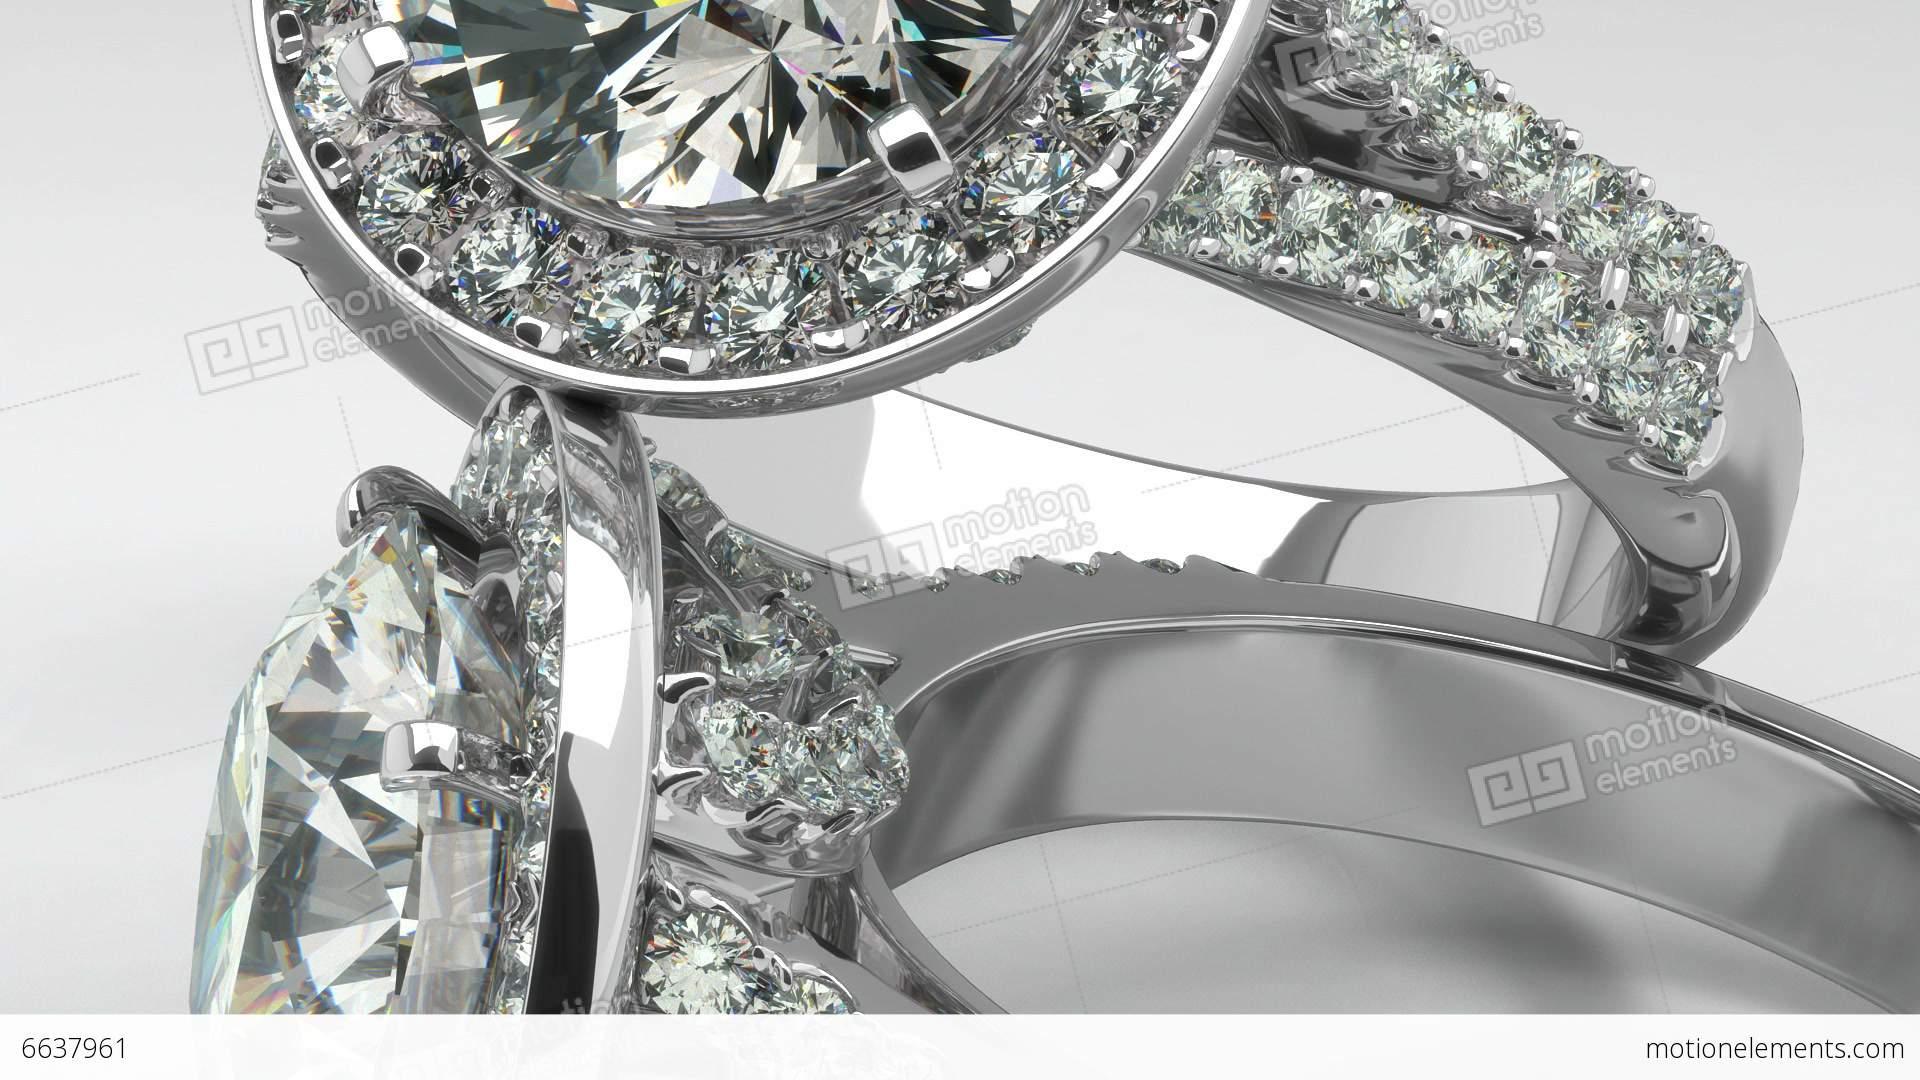 Precious Diamond Rings Stock Animation  6637961. Topaz Stud Earrings. Camo Bands. Grandchild Bracelet. Plain Sterling Silver Bangle. Greek Rings. Moss Agate Bracelet. Anklet Bracelet Pandora. Silver Engagement Rings